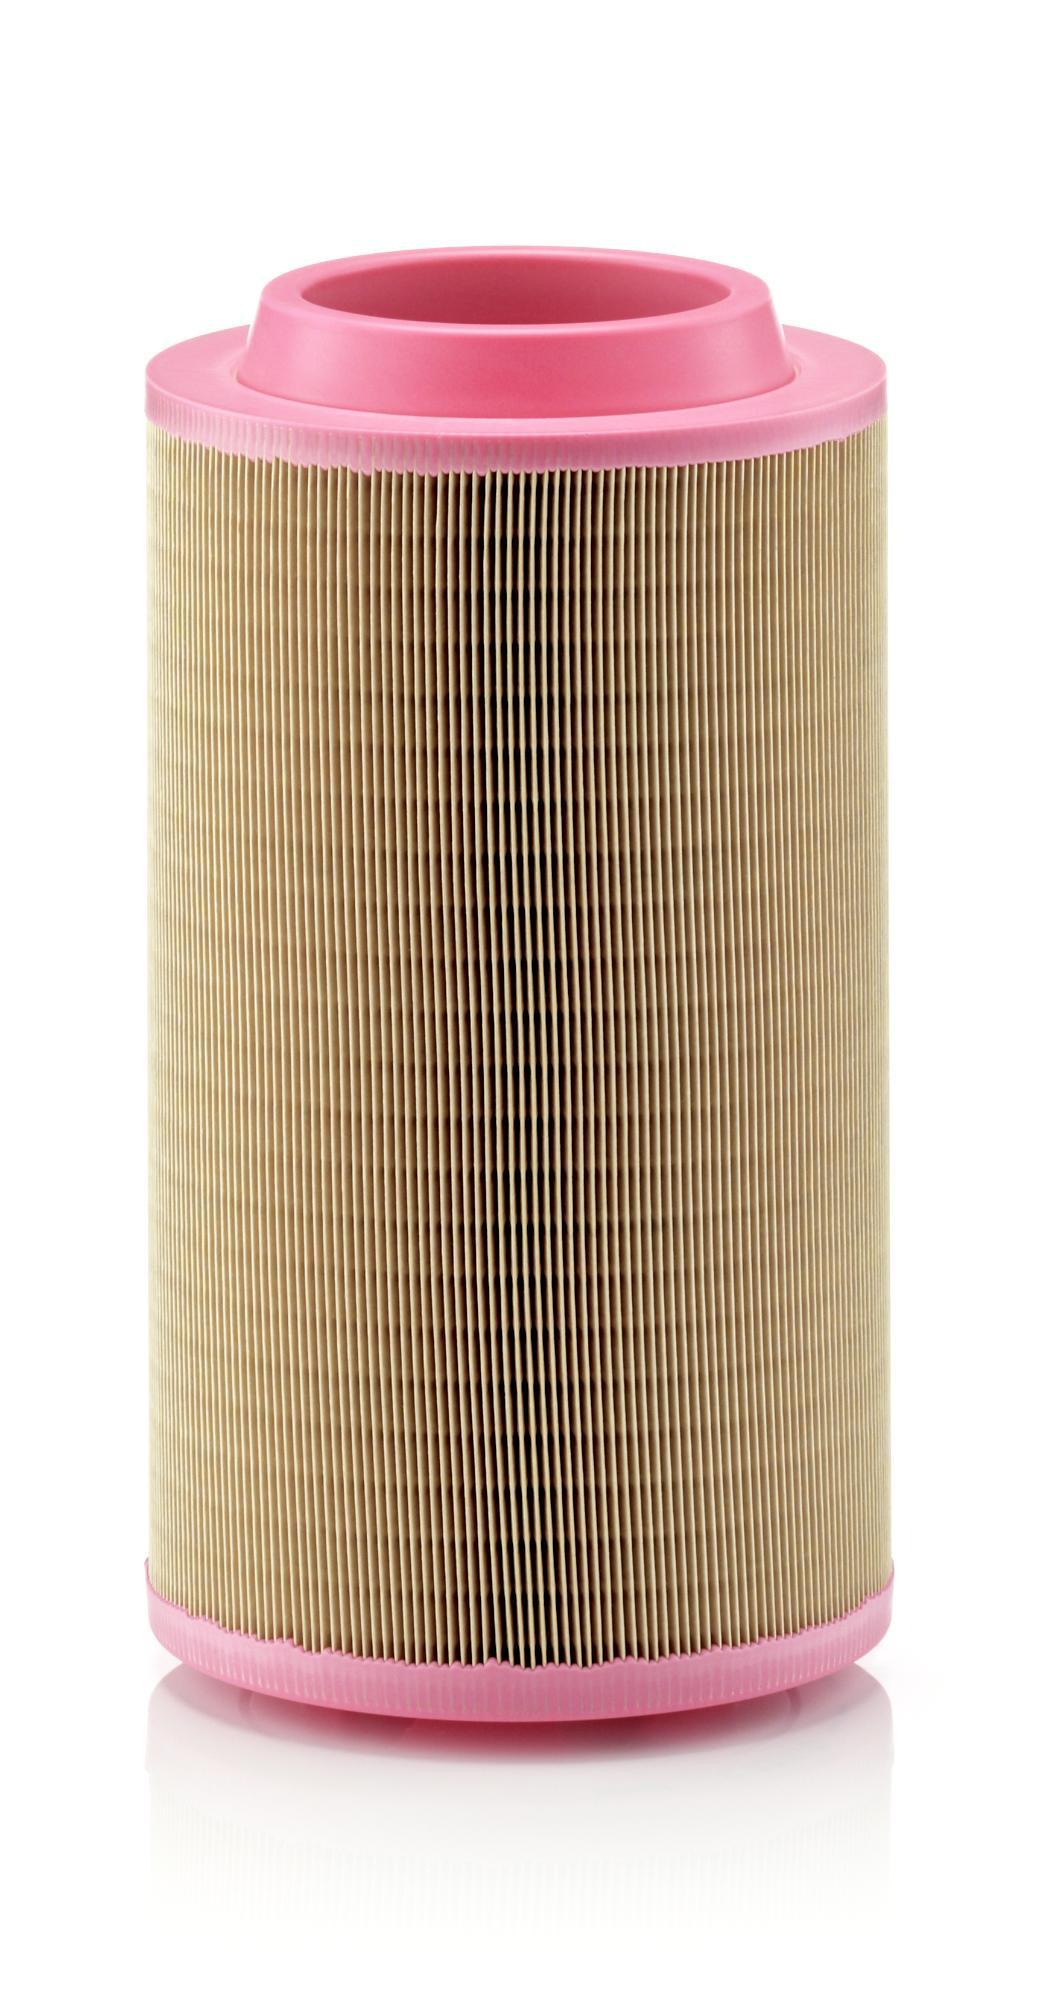 MANN-FILTER Filtr powietrza do FUSO (MITSUBISHI) - numer produktu: C 23 610